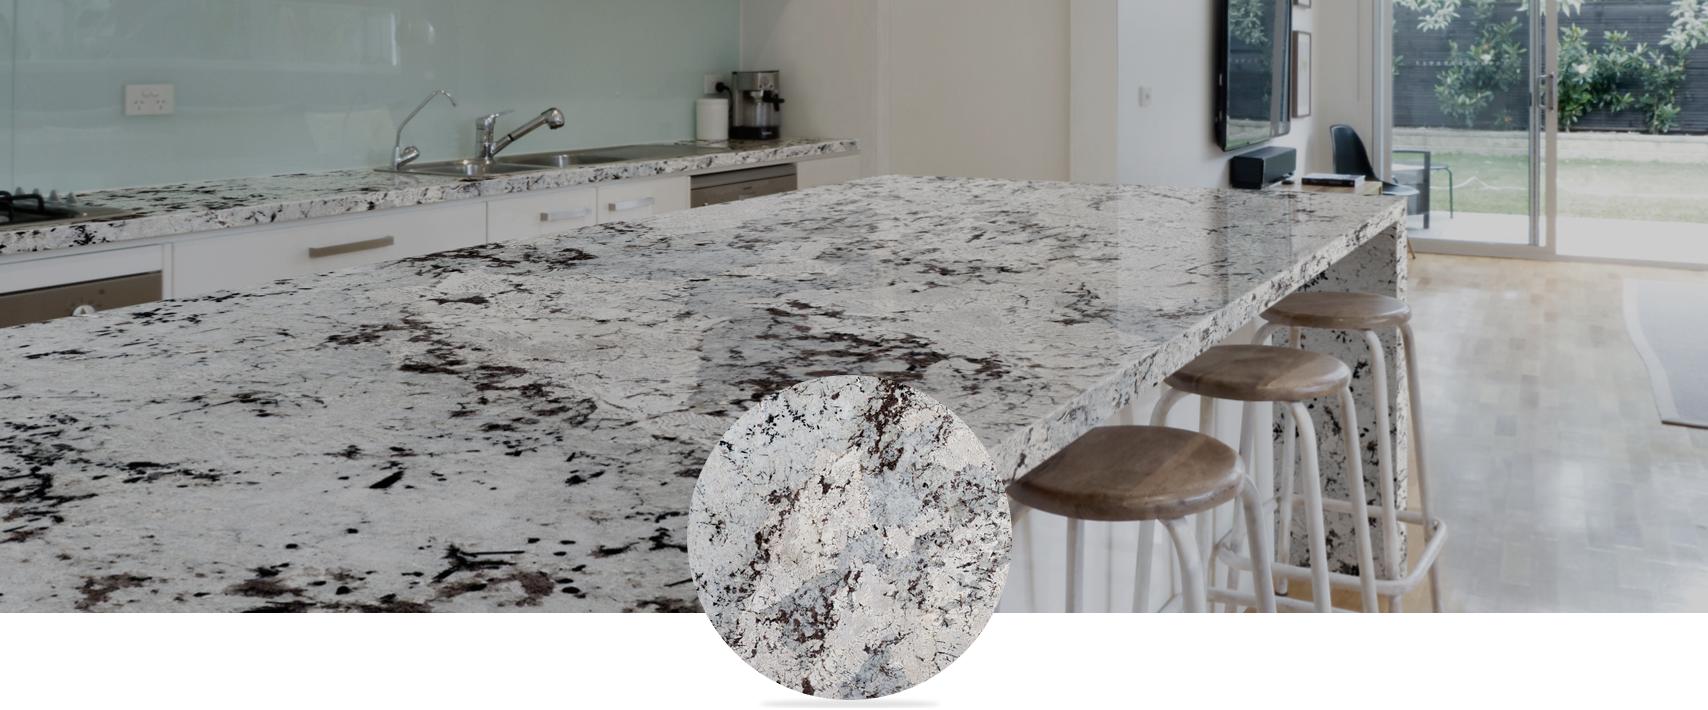 kamień White and grey granite